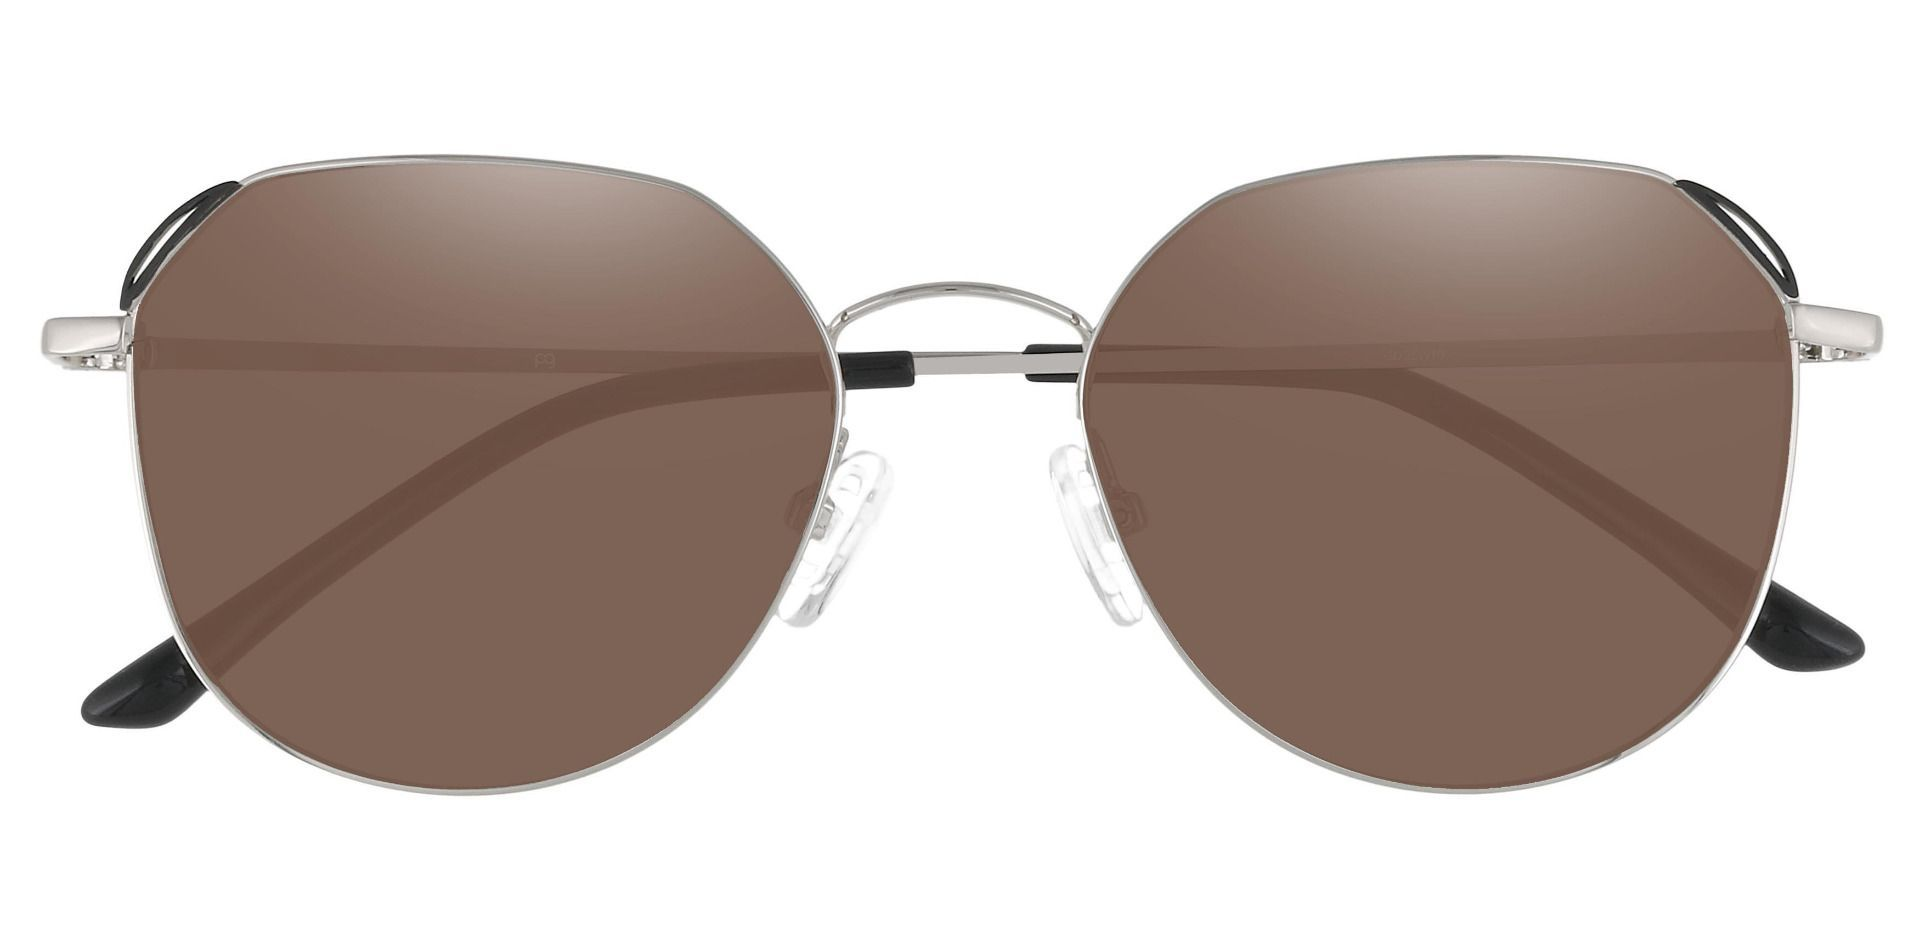 Figaro Geometric Prescription Sunglasses - Silver Frame With Brown Lenses